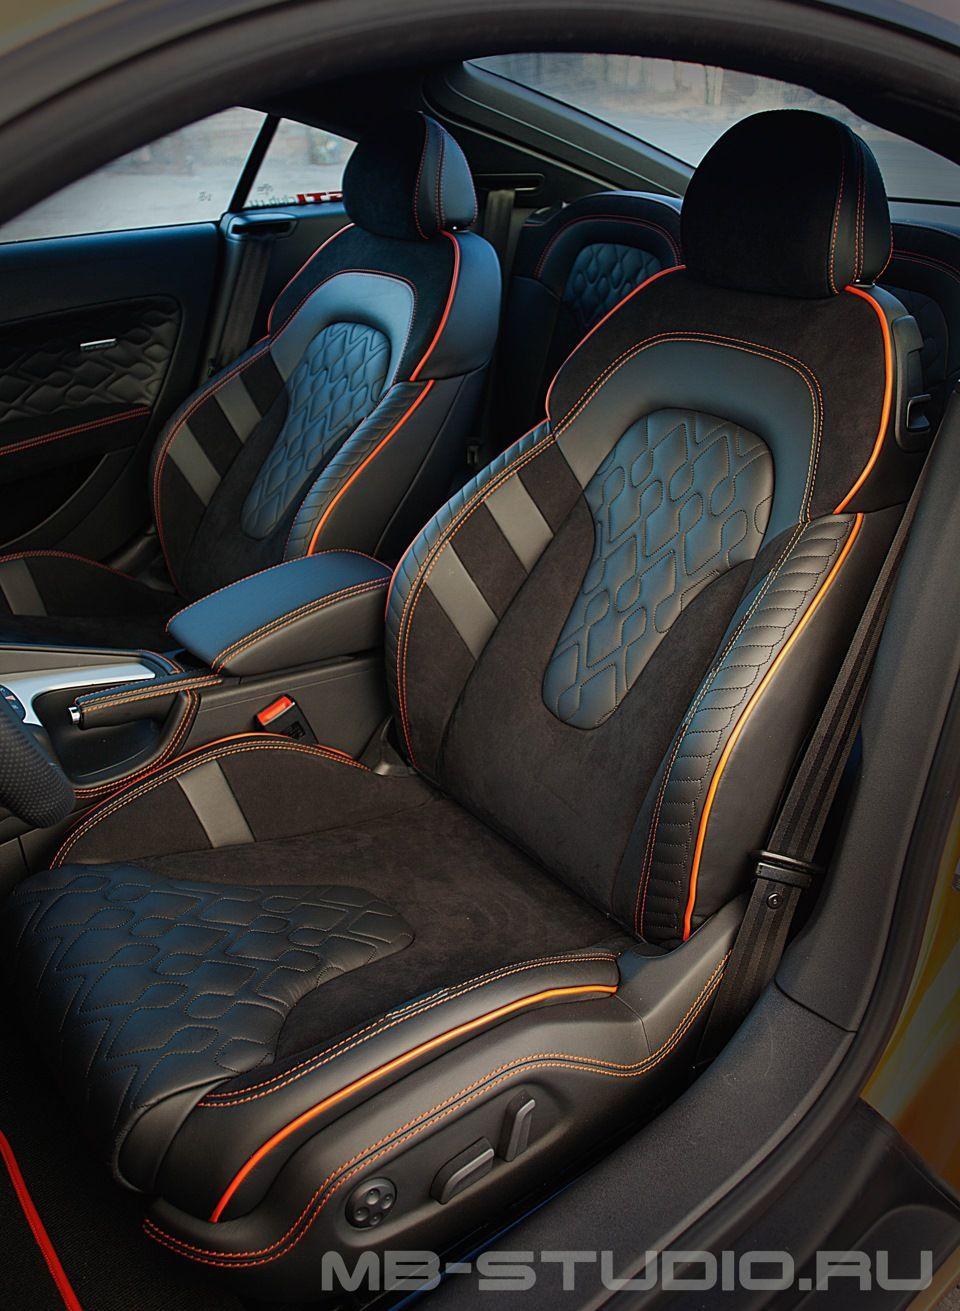 Interer Audi Tt Versiya Exclusive Salon Dlya Audi Ot Mbs With